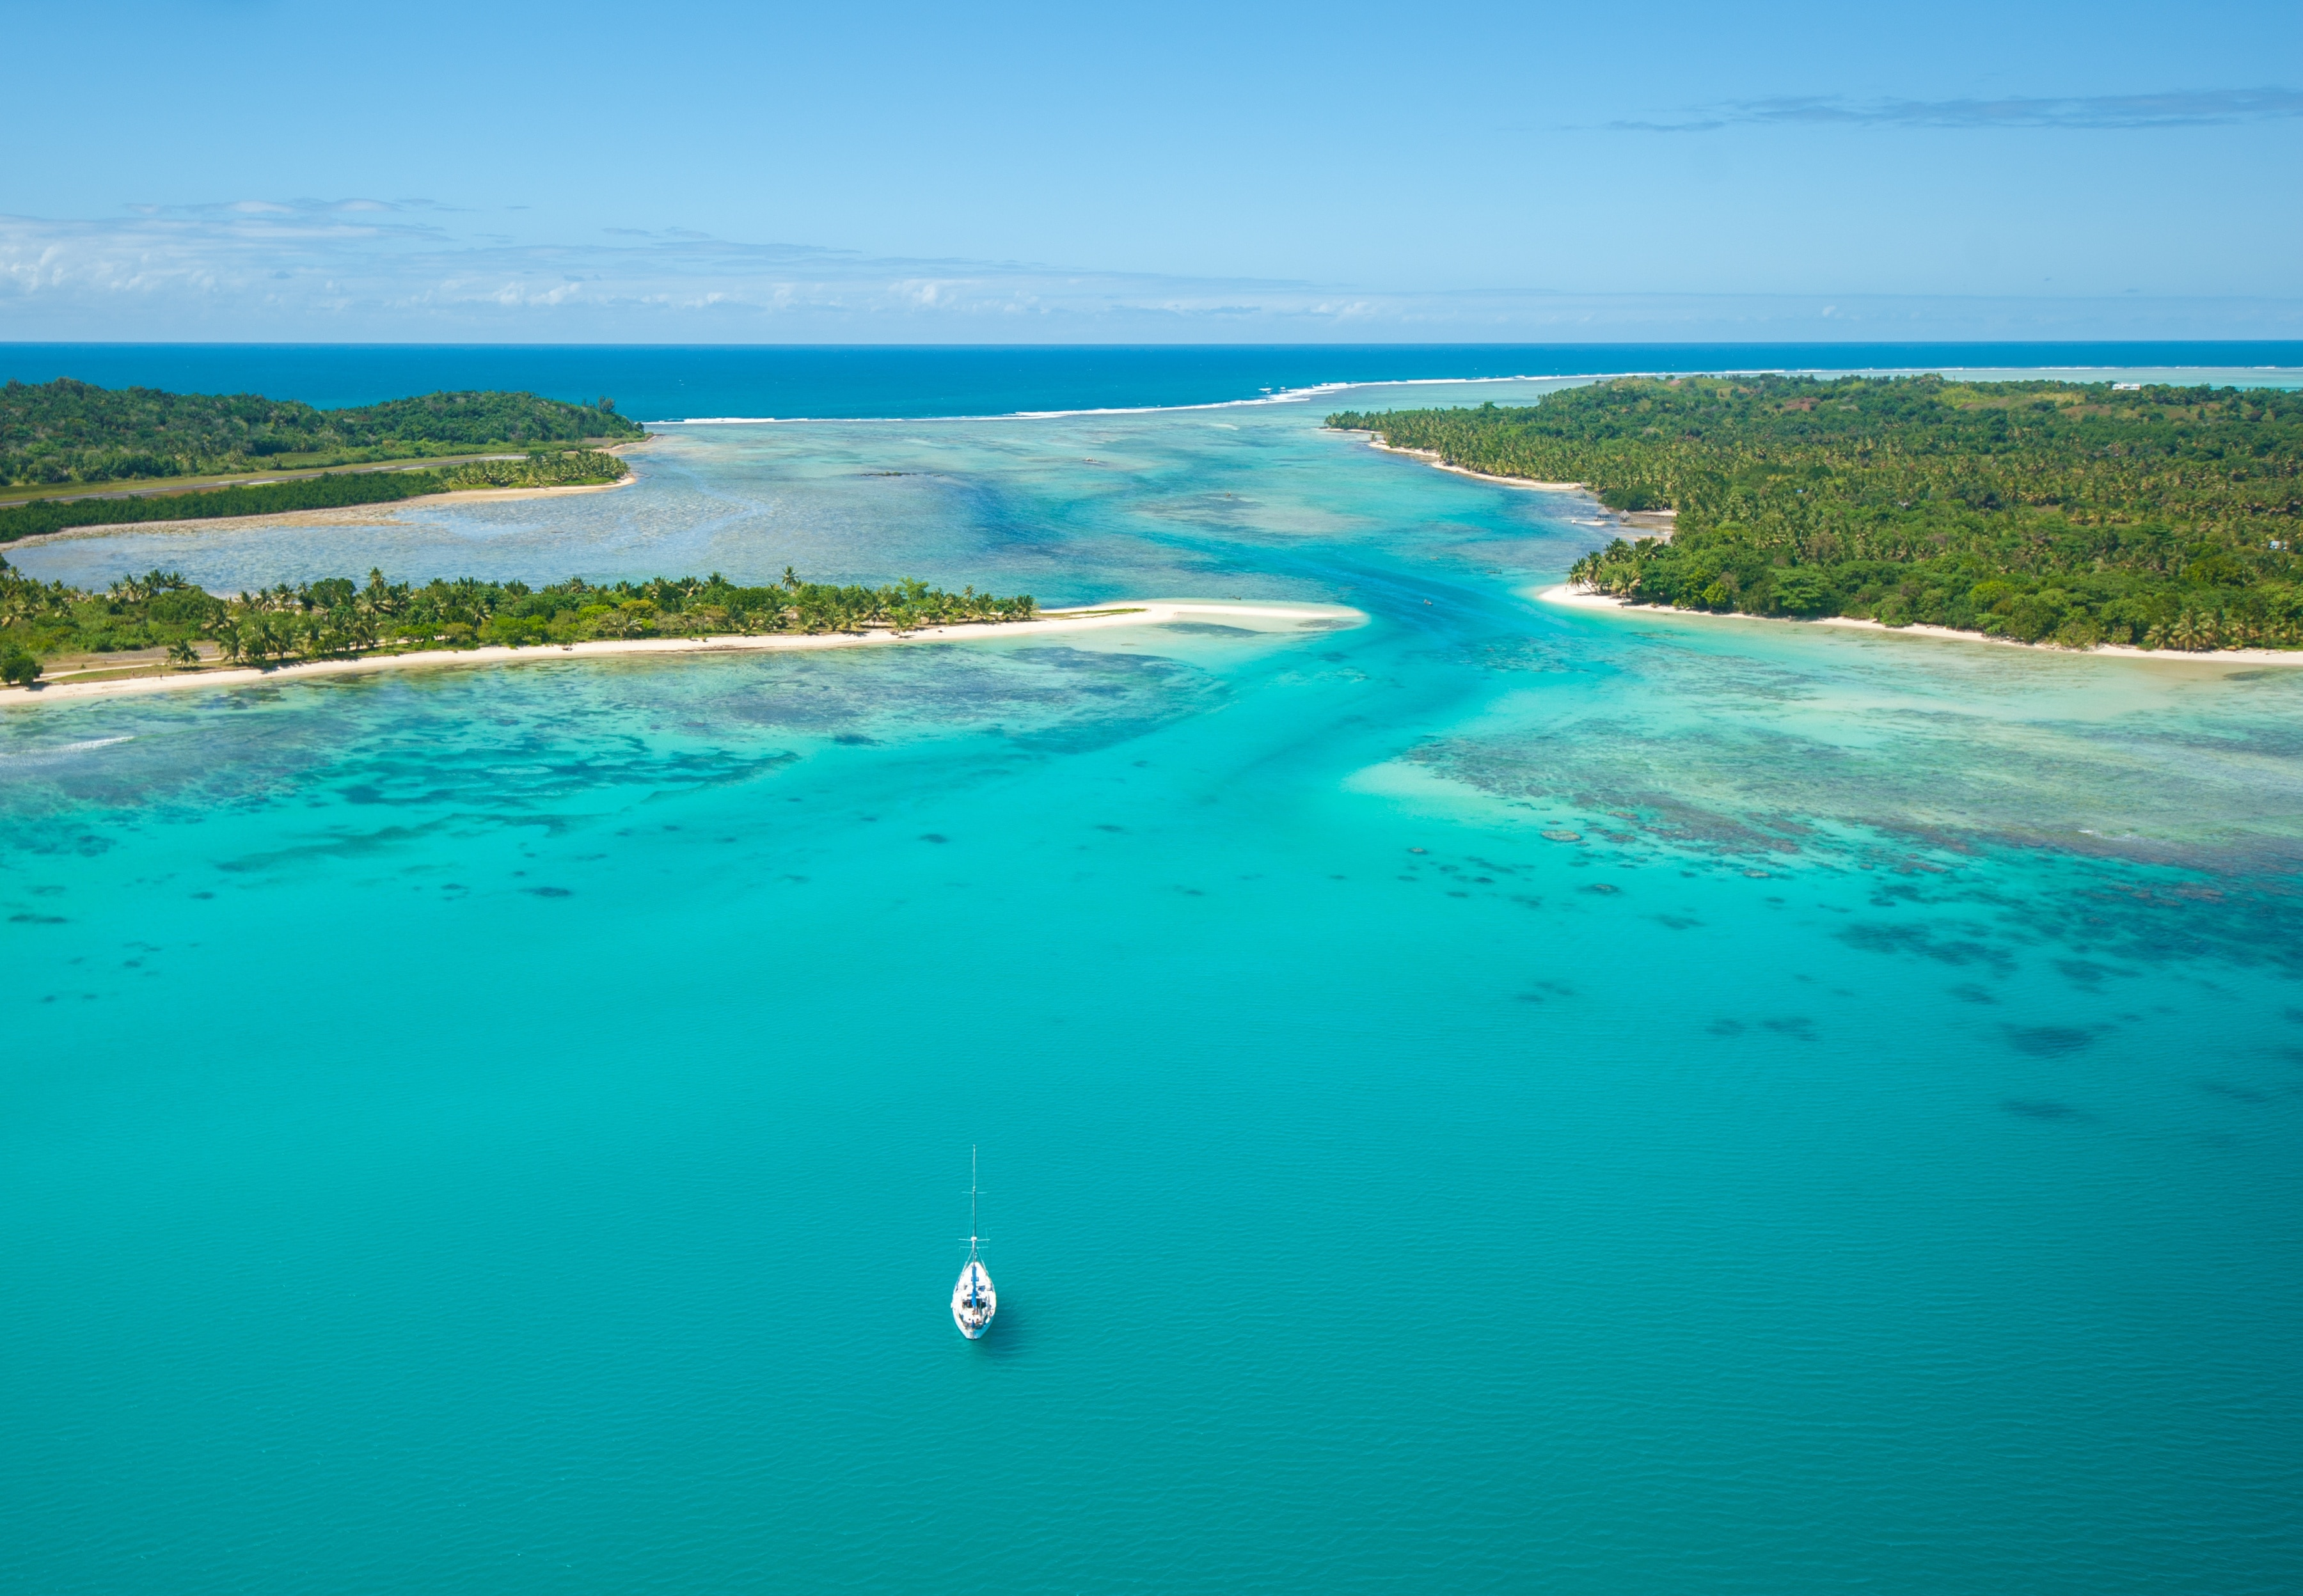 Analanjirofo, Madagascar